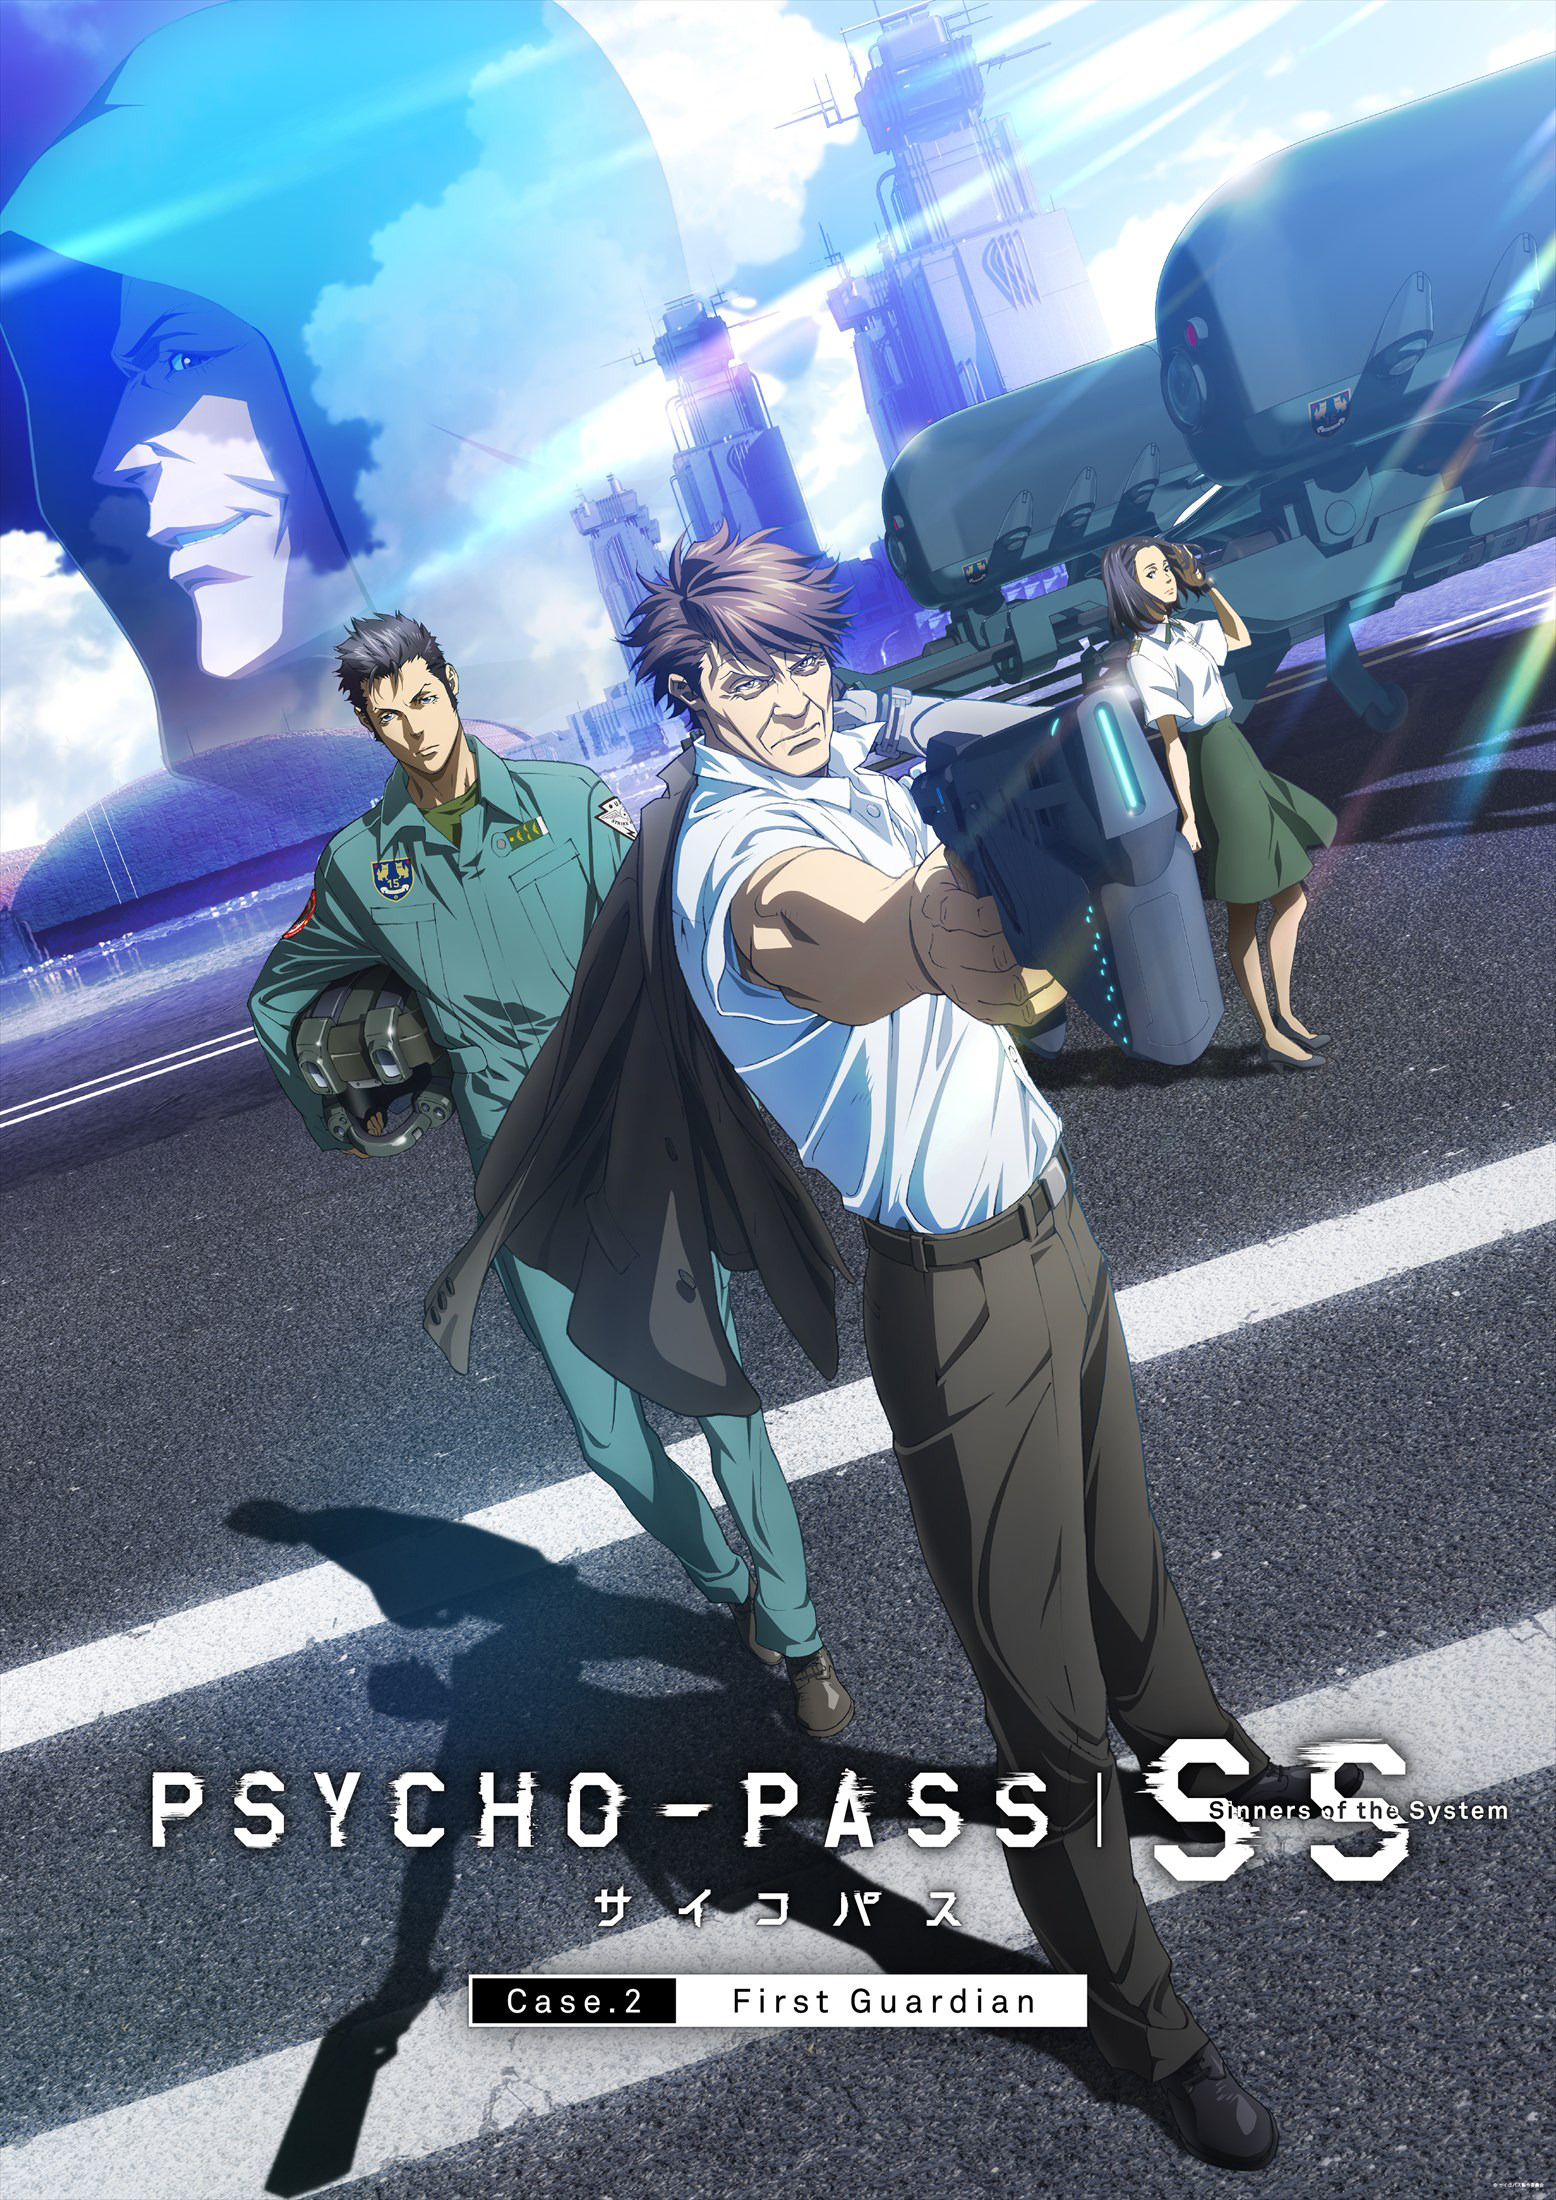 Psycho Pass Season 2 Episodes